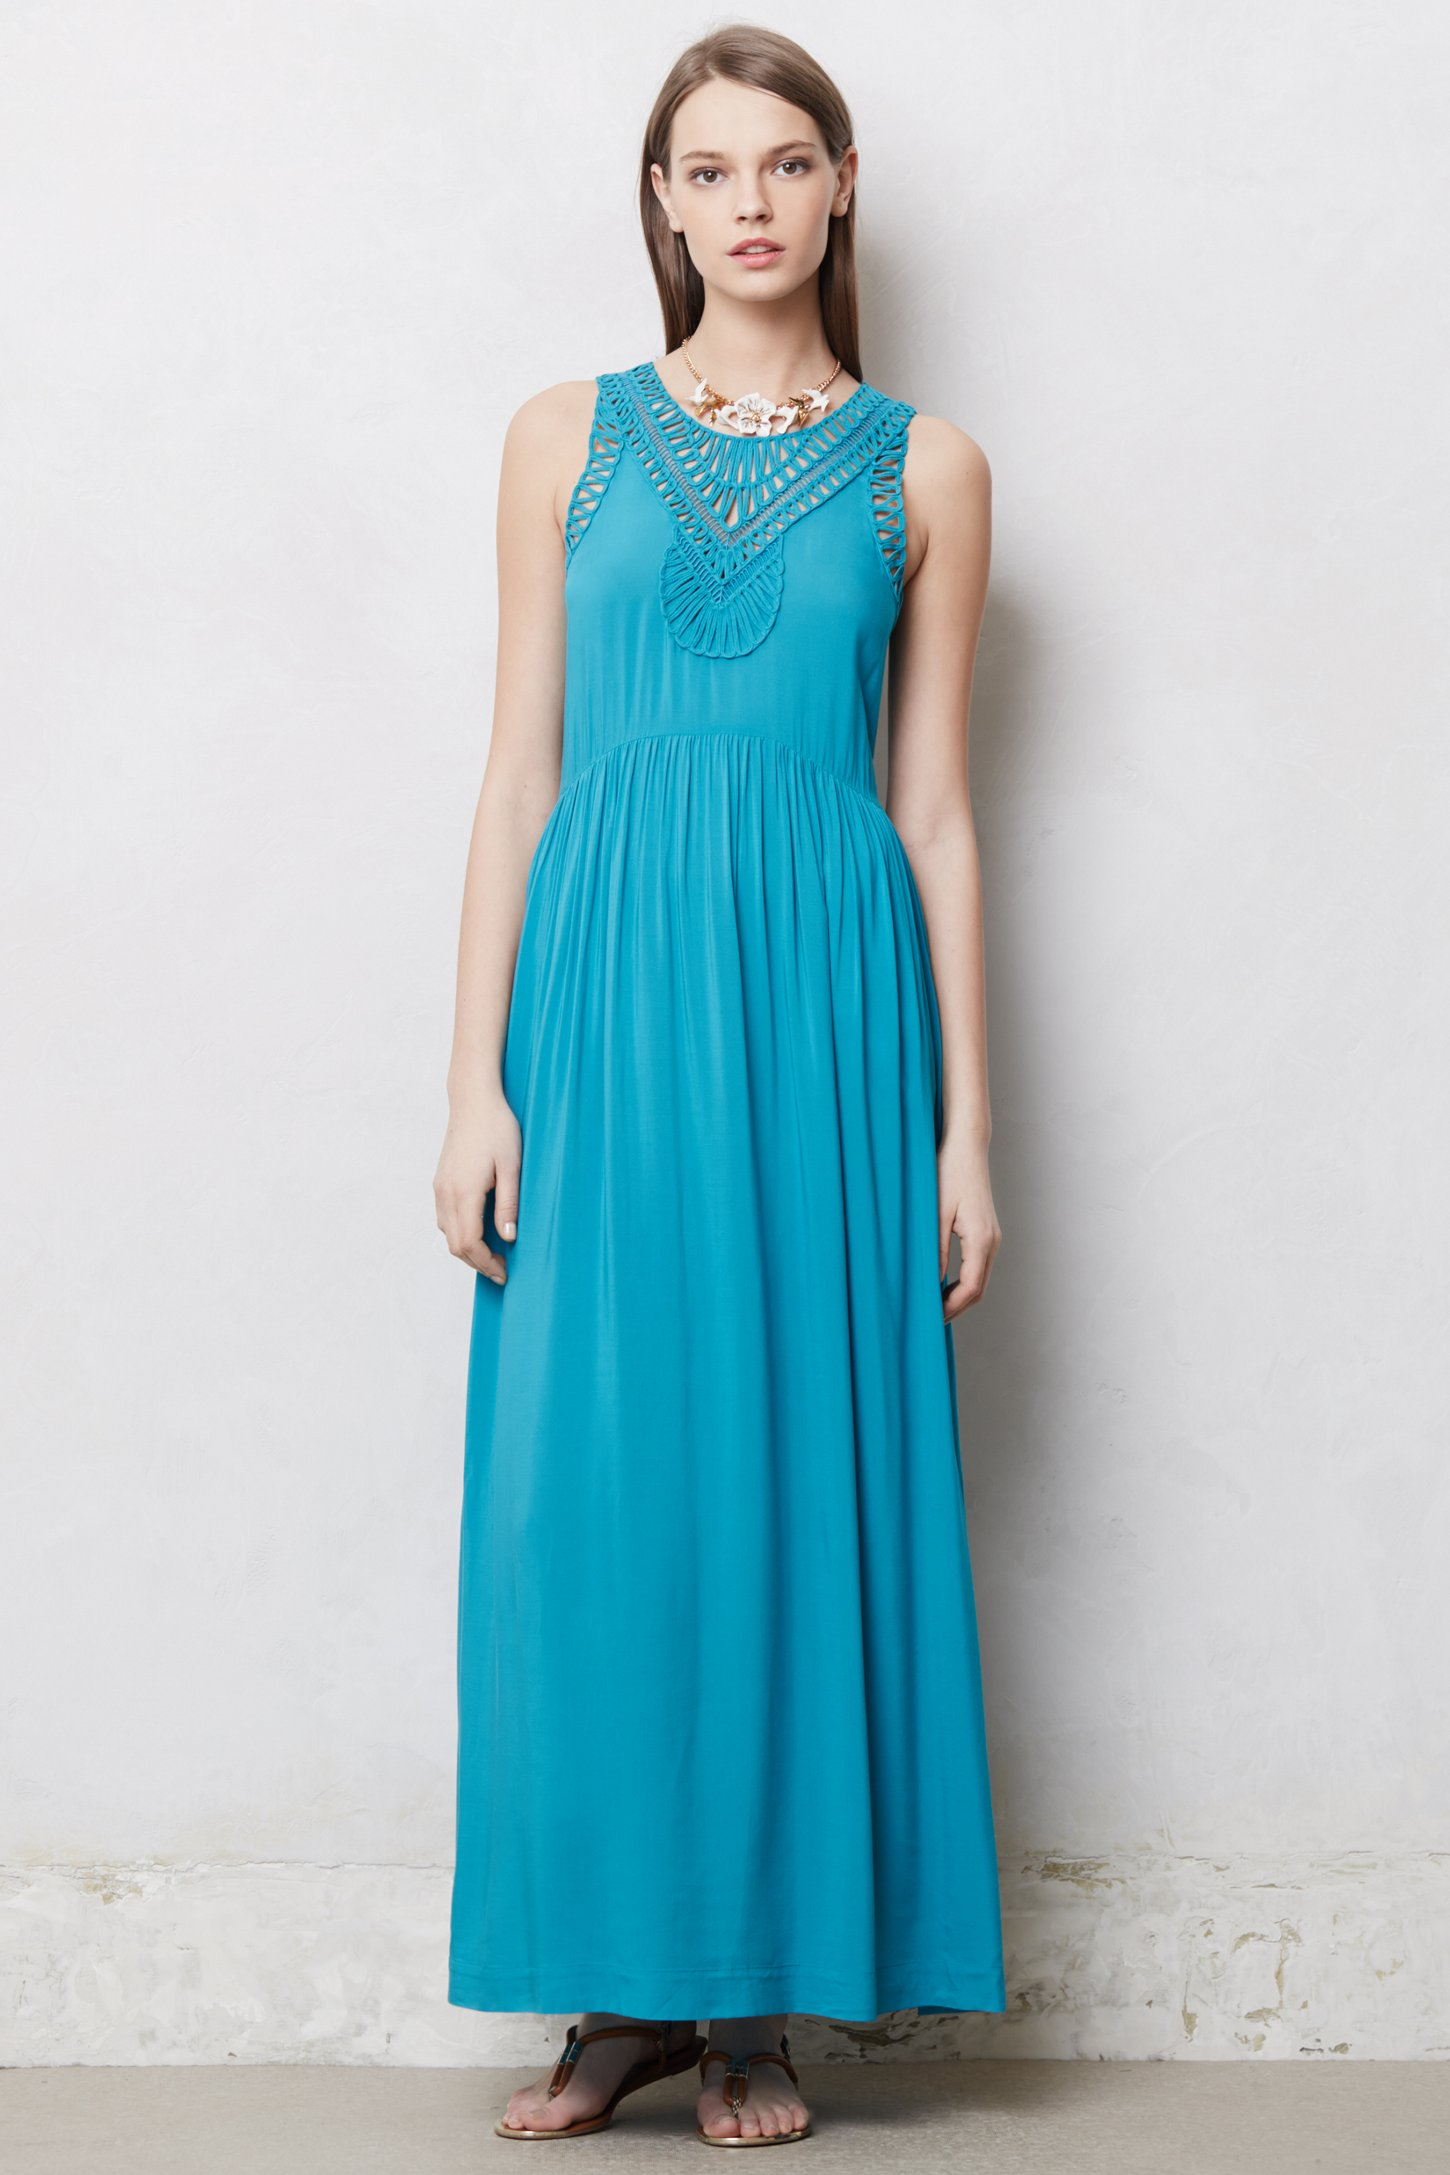 Lyst - Anthropologie Macrame Day Dress in Blue